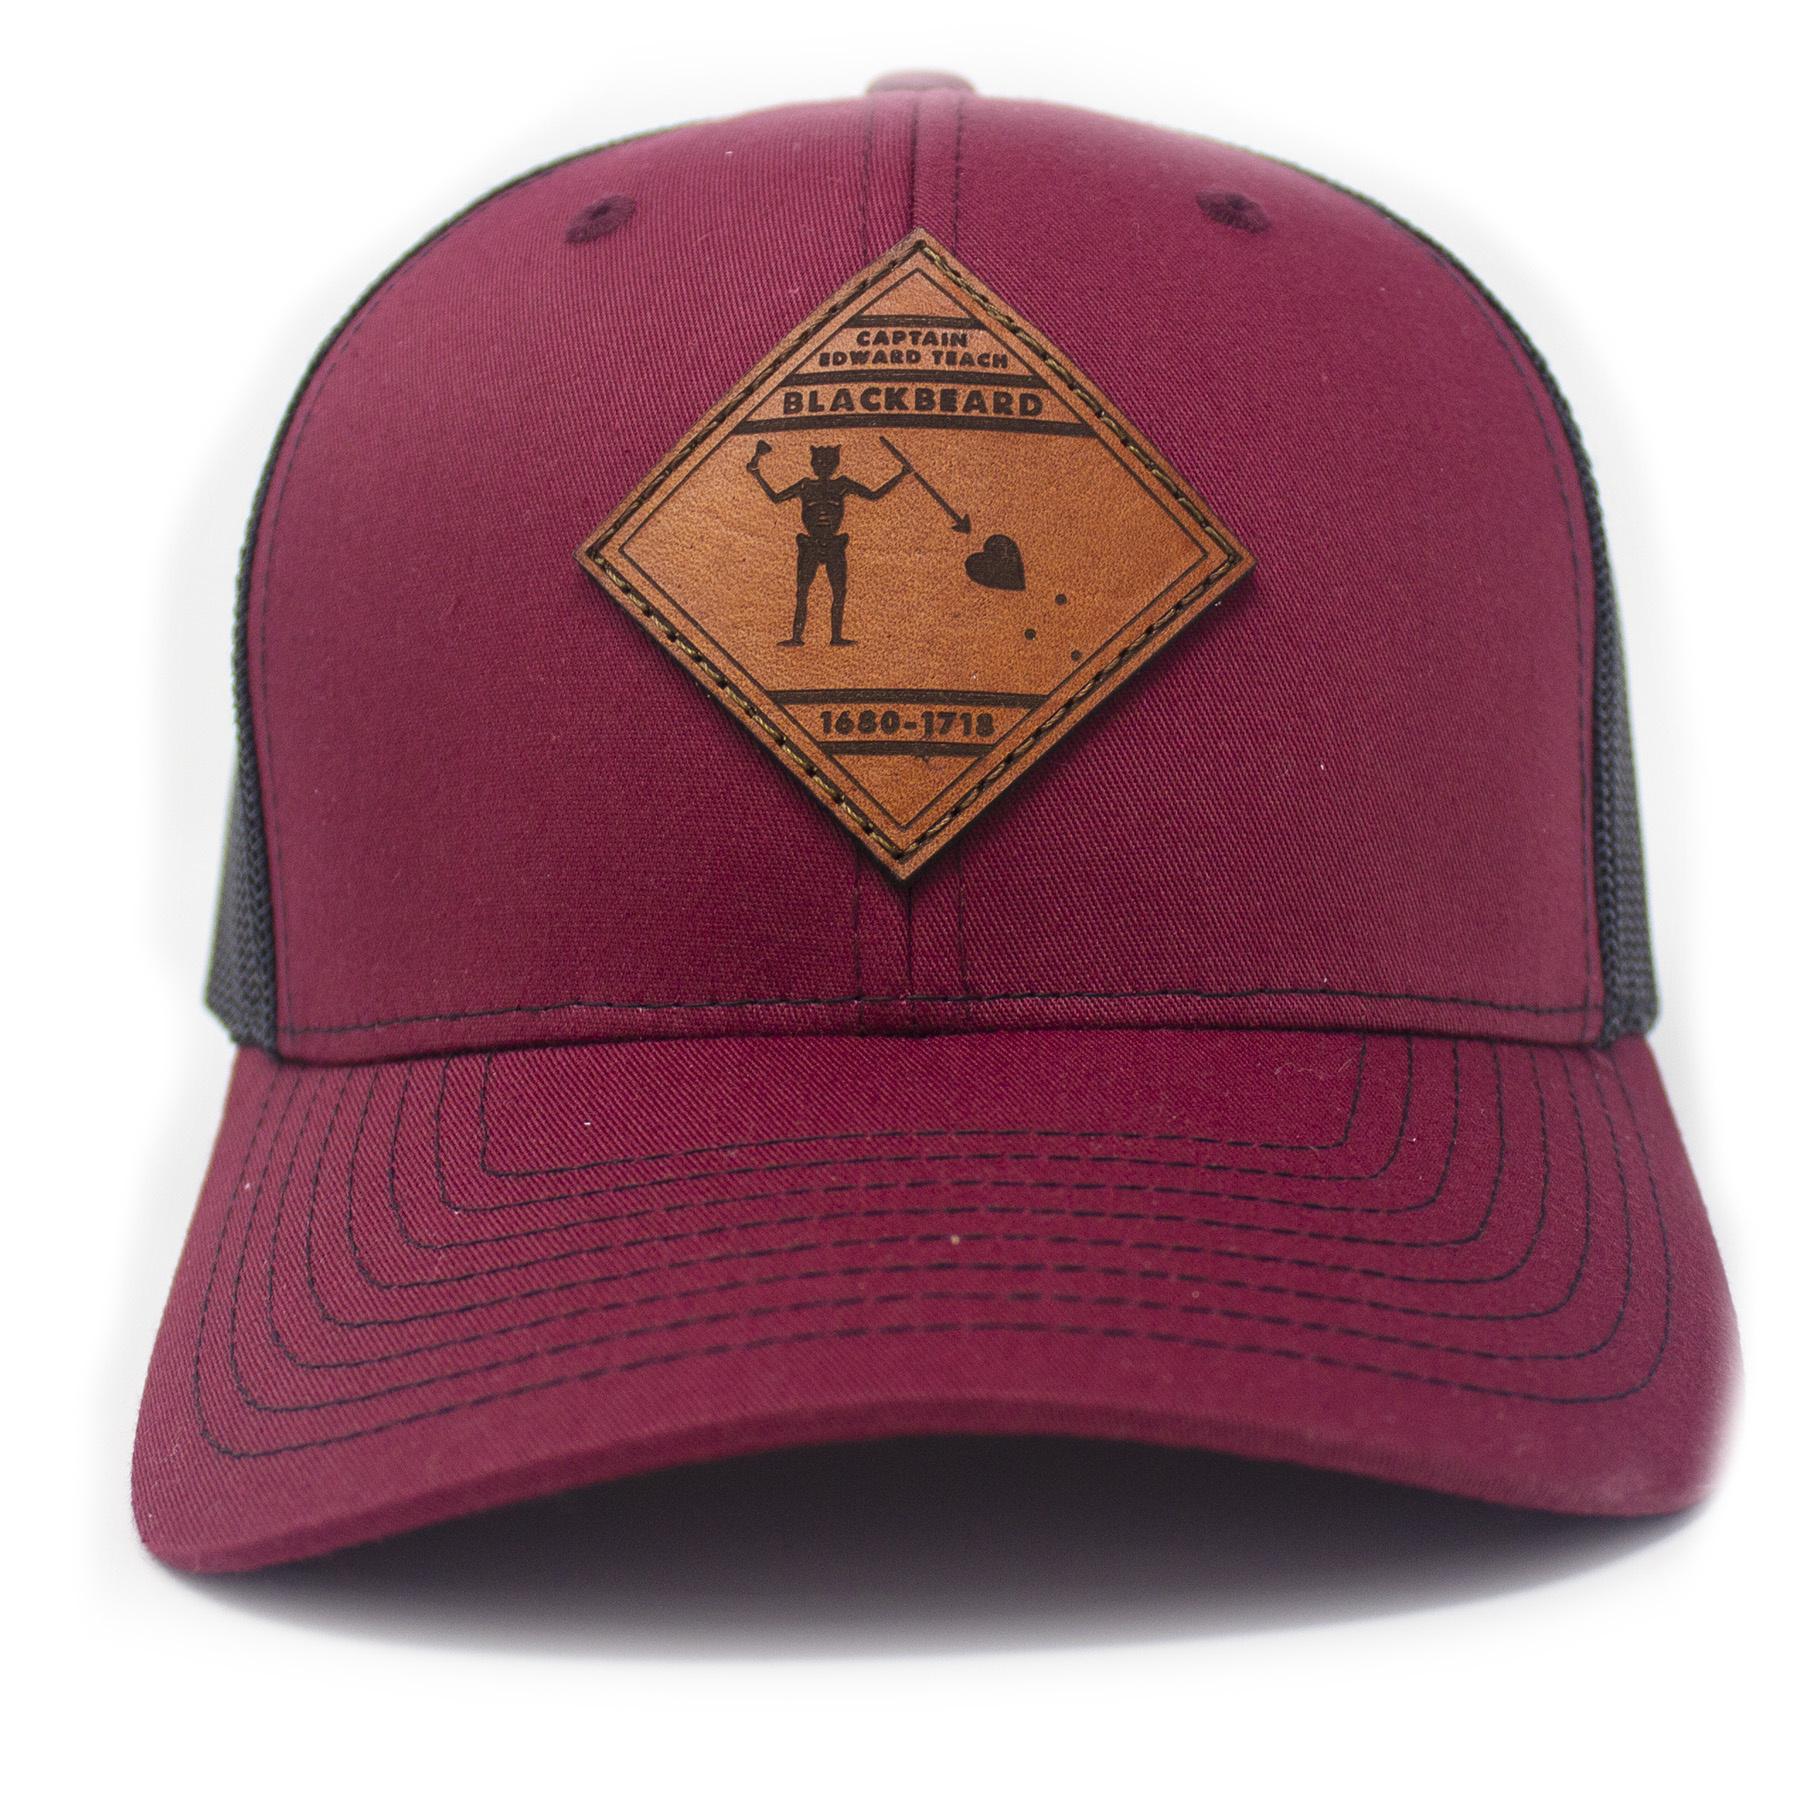 Blackbeard Leather Patch Lo Pro Trucker Hat, Cardinal and Black-4